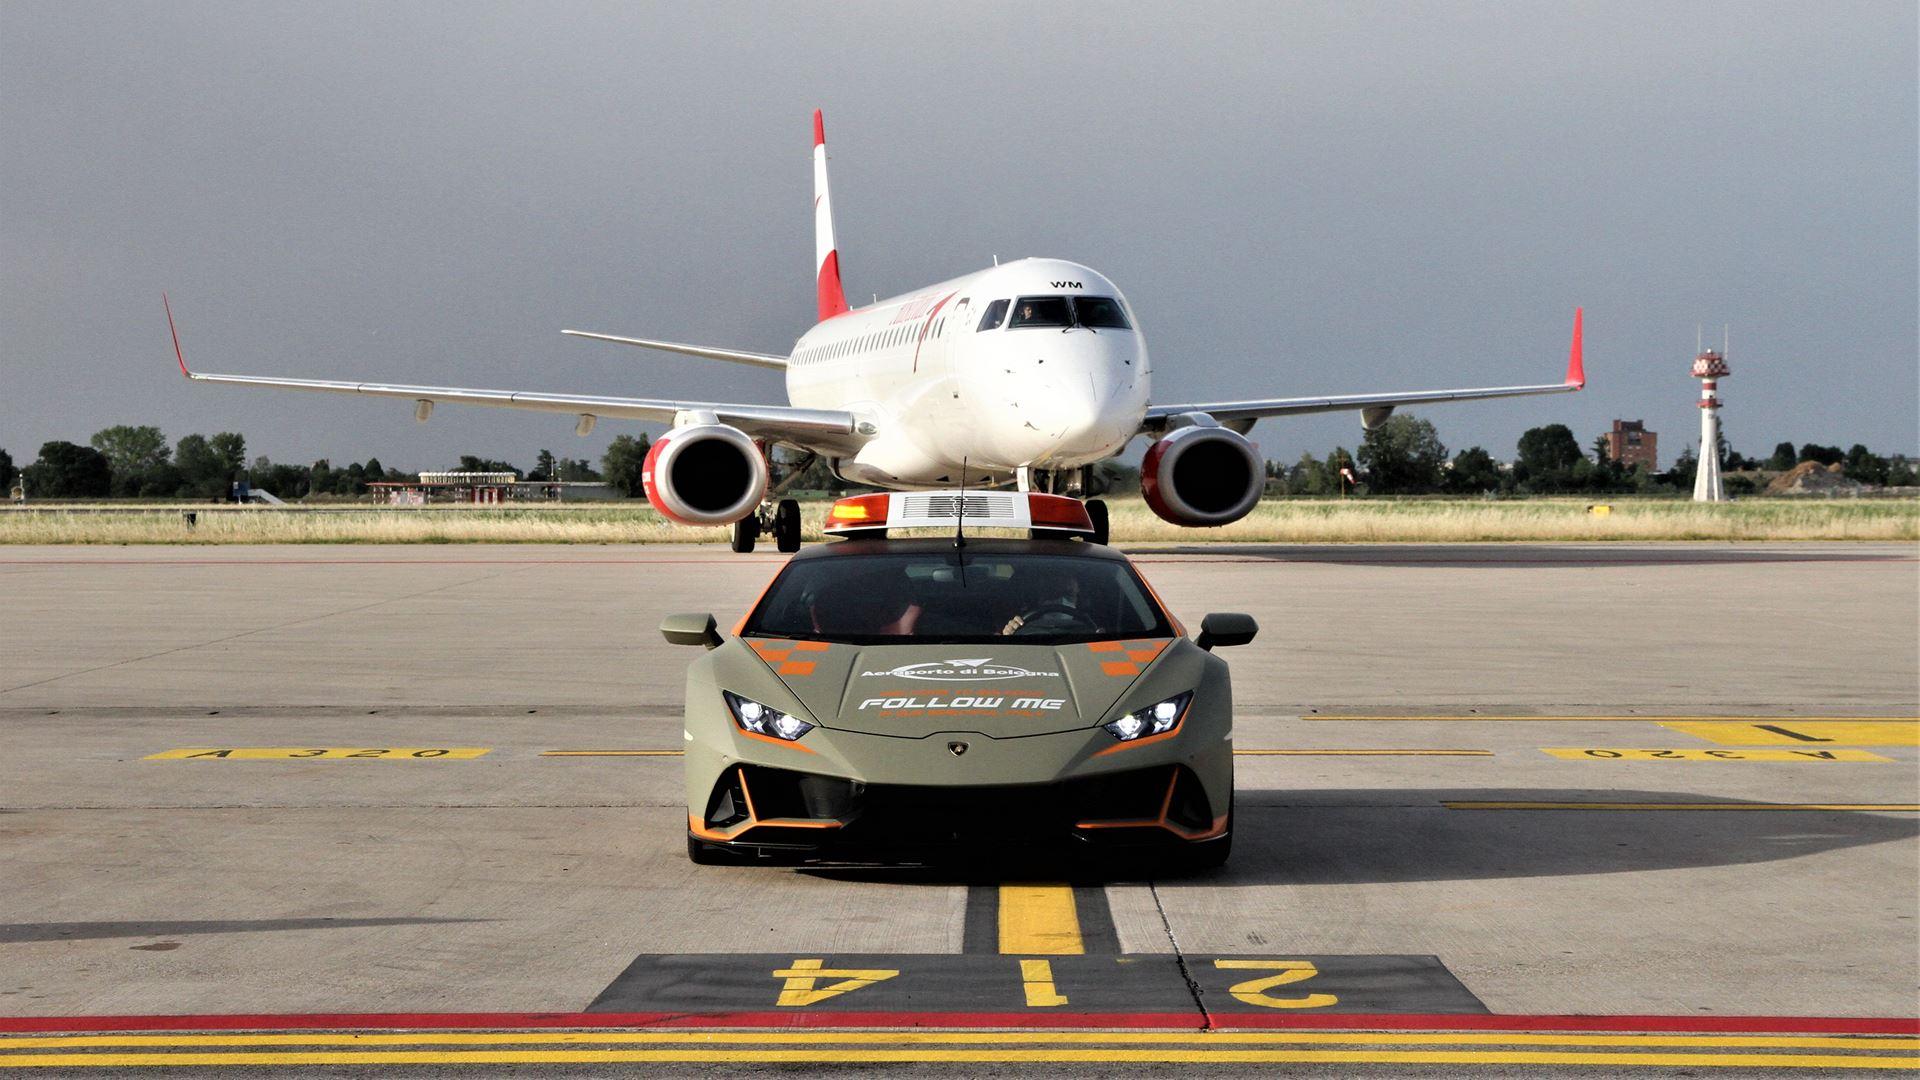 A new Lamborghini Huracán EVO follow-me car for Bologna Airport - Image 6